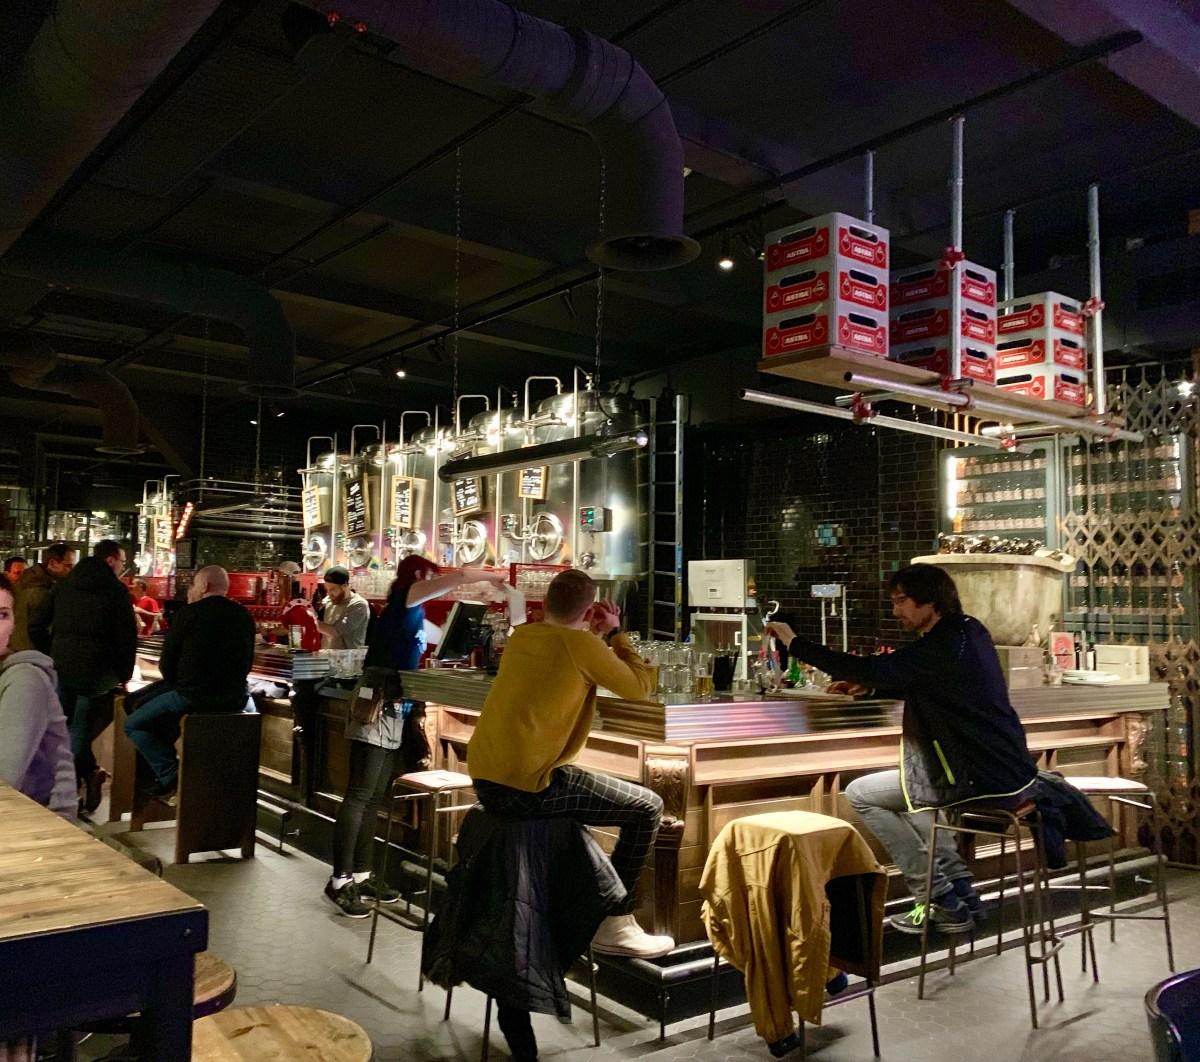 Astra Brauerei: Theke mit Stahltanks 2